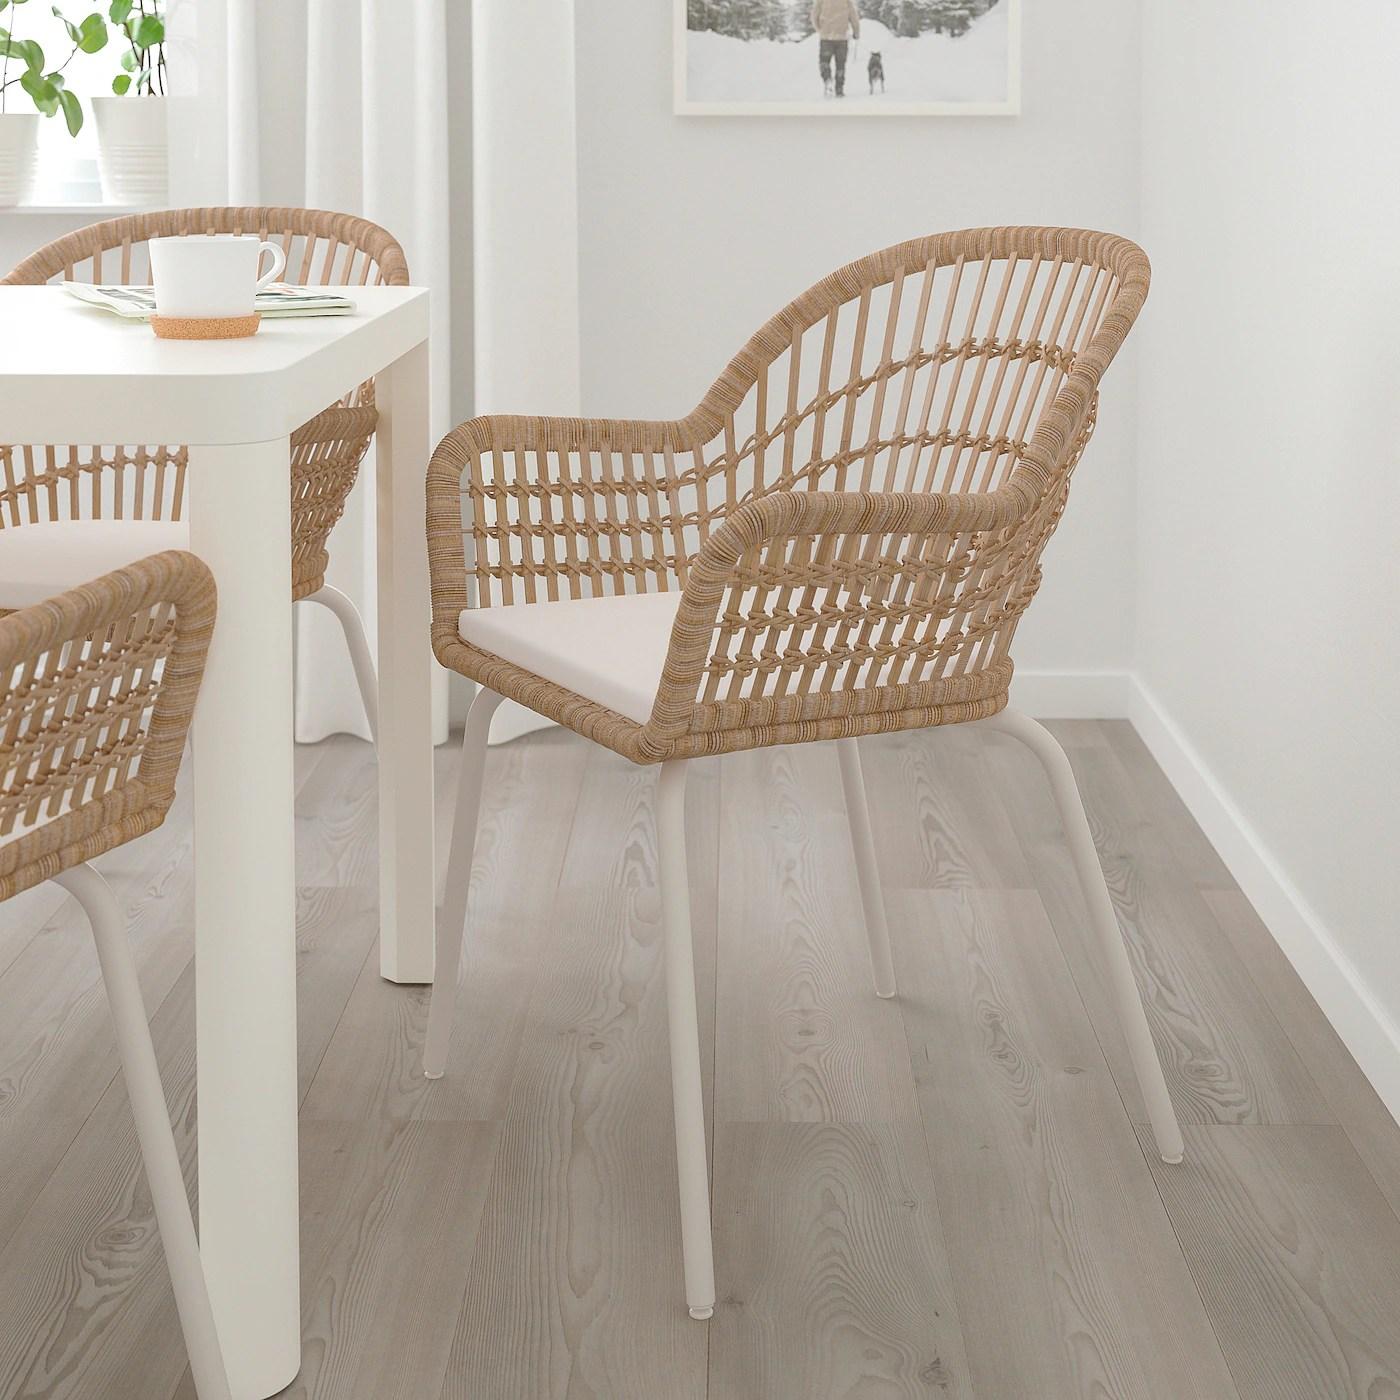 nilsove norna chaise coussin rotin blanc laila naturel